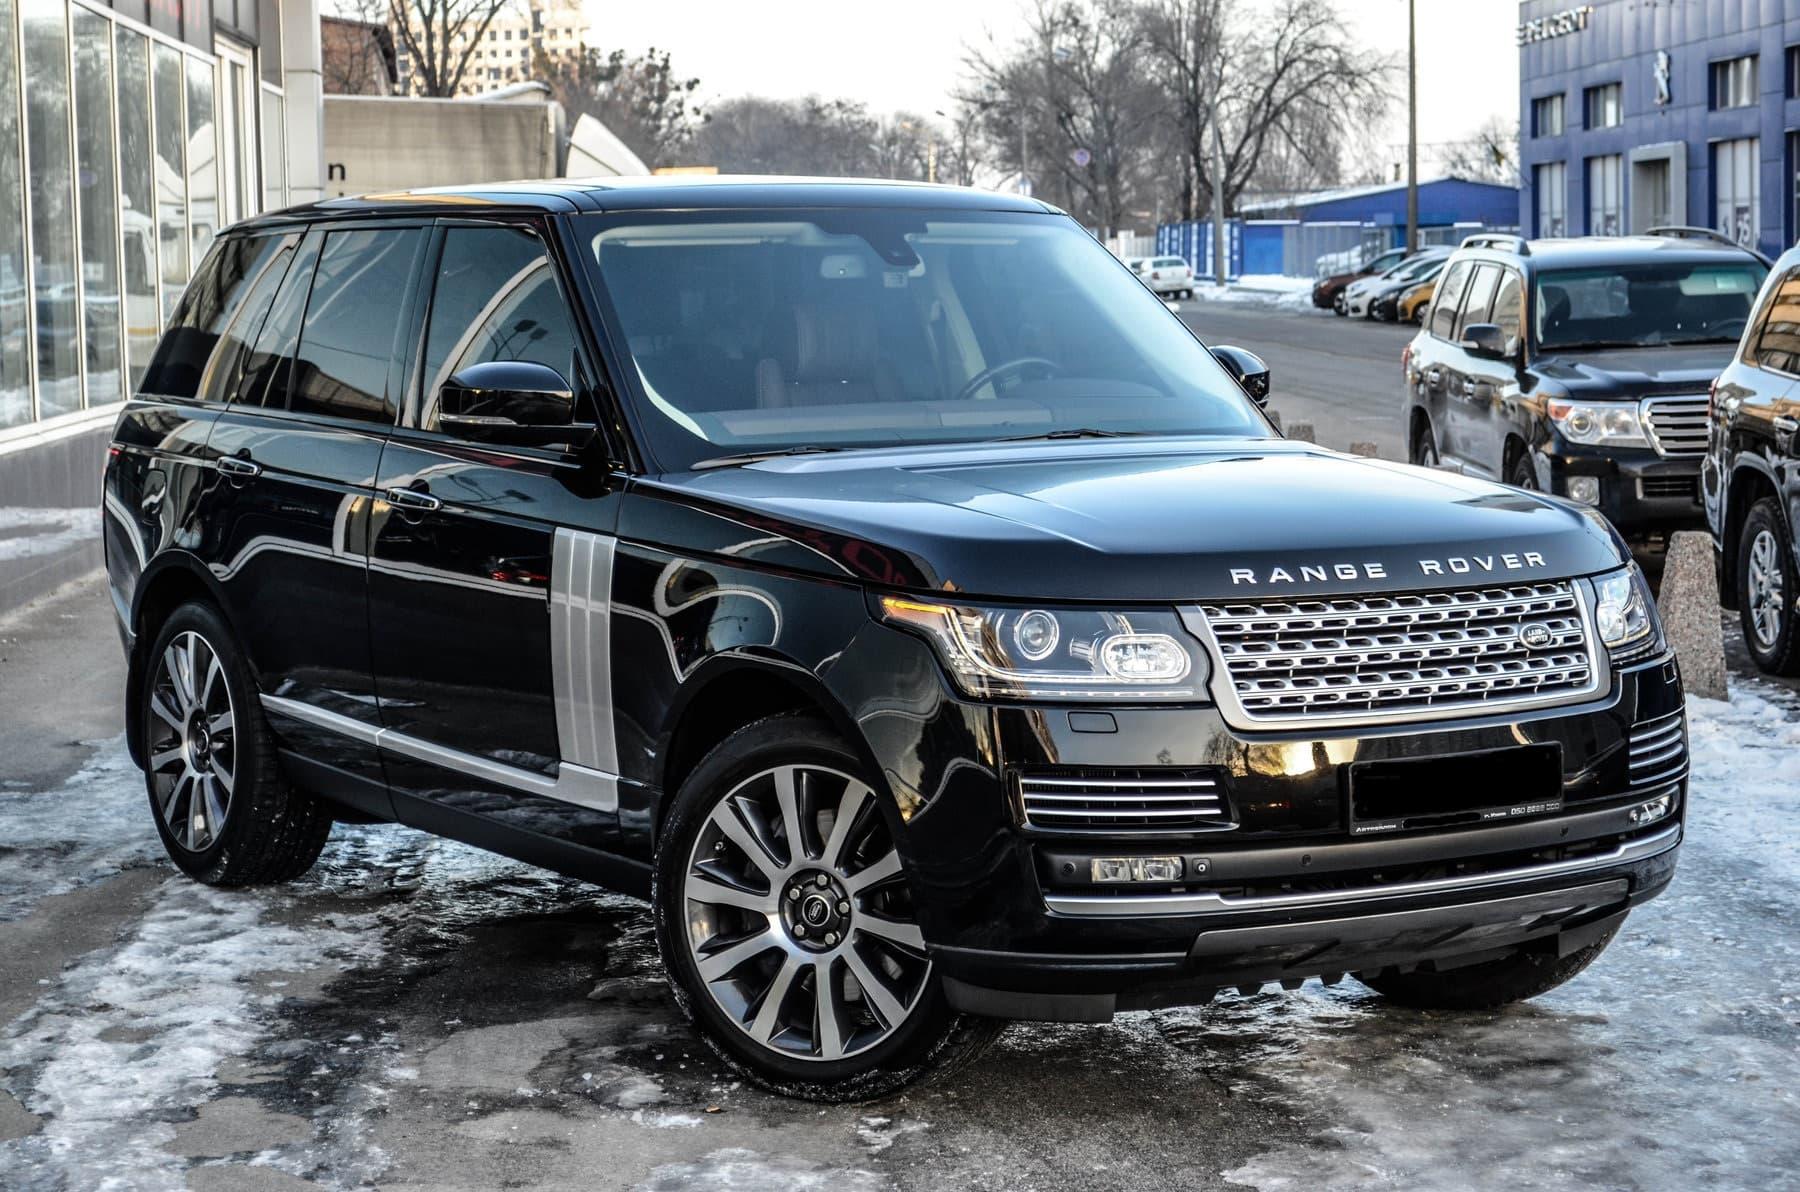 Land Rover Range Rover AUTOBIOGRAPHY - фото 1